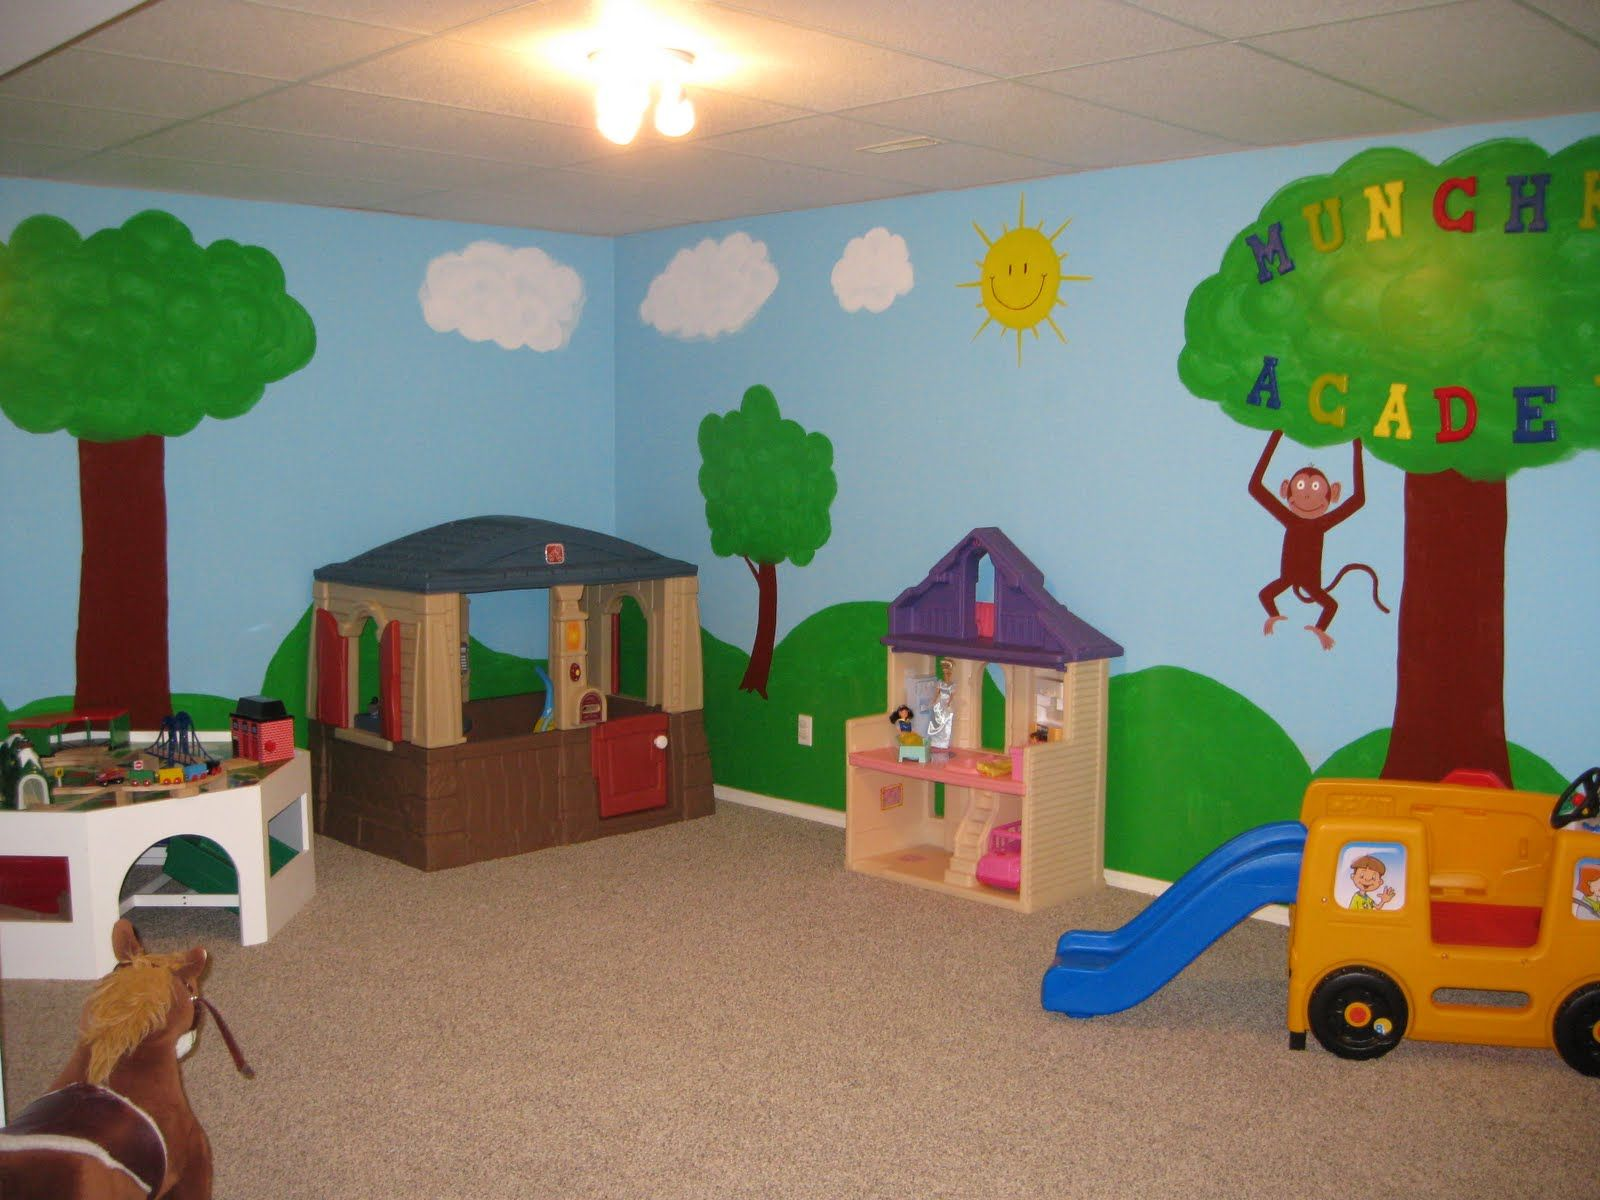 Toddler Playroom Indoor Playground